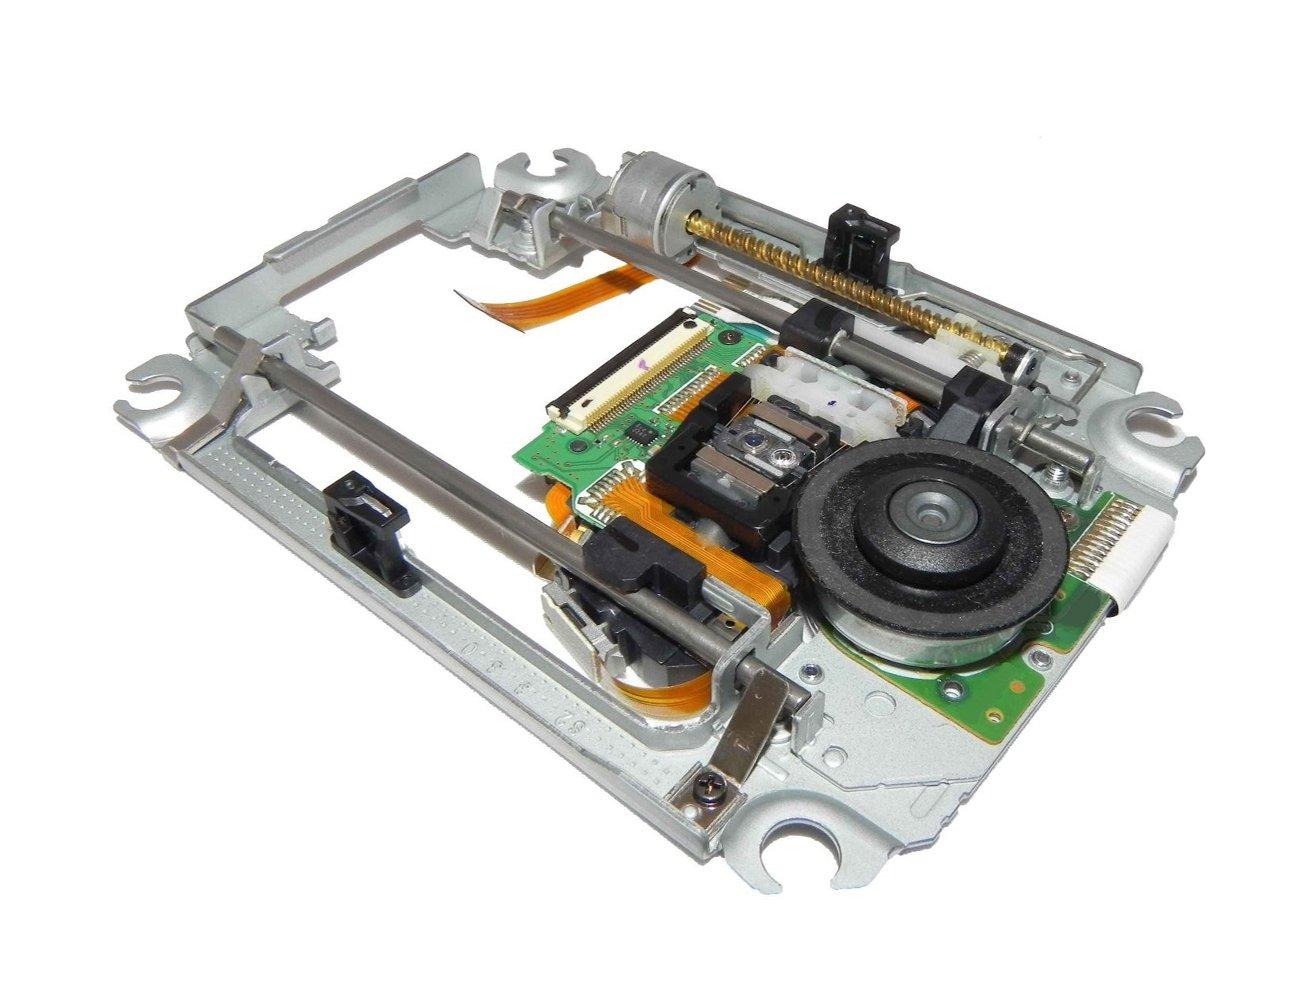 Reemplazo de Solo Laser para PS3 KES-450A KEM-450AAA  (UWDY)